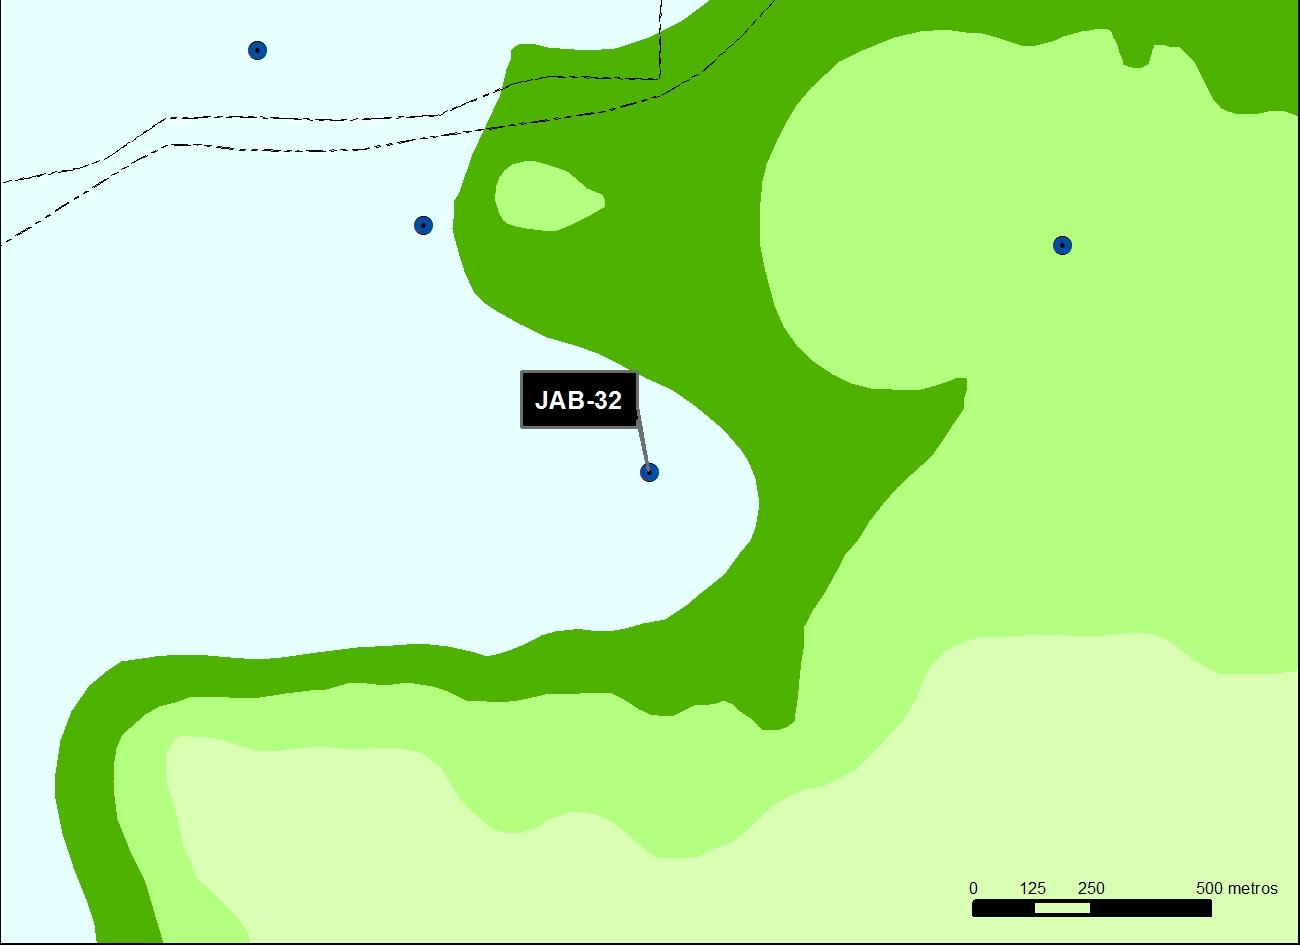 JAB_32_M.V.LOZANO_HONTANARES_MAP.GEOL